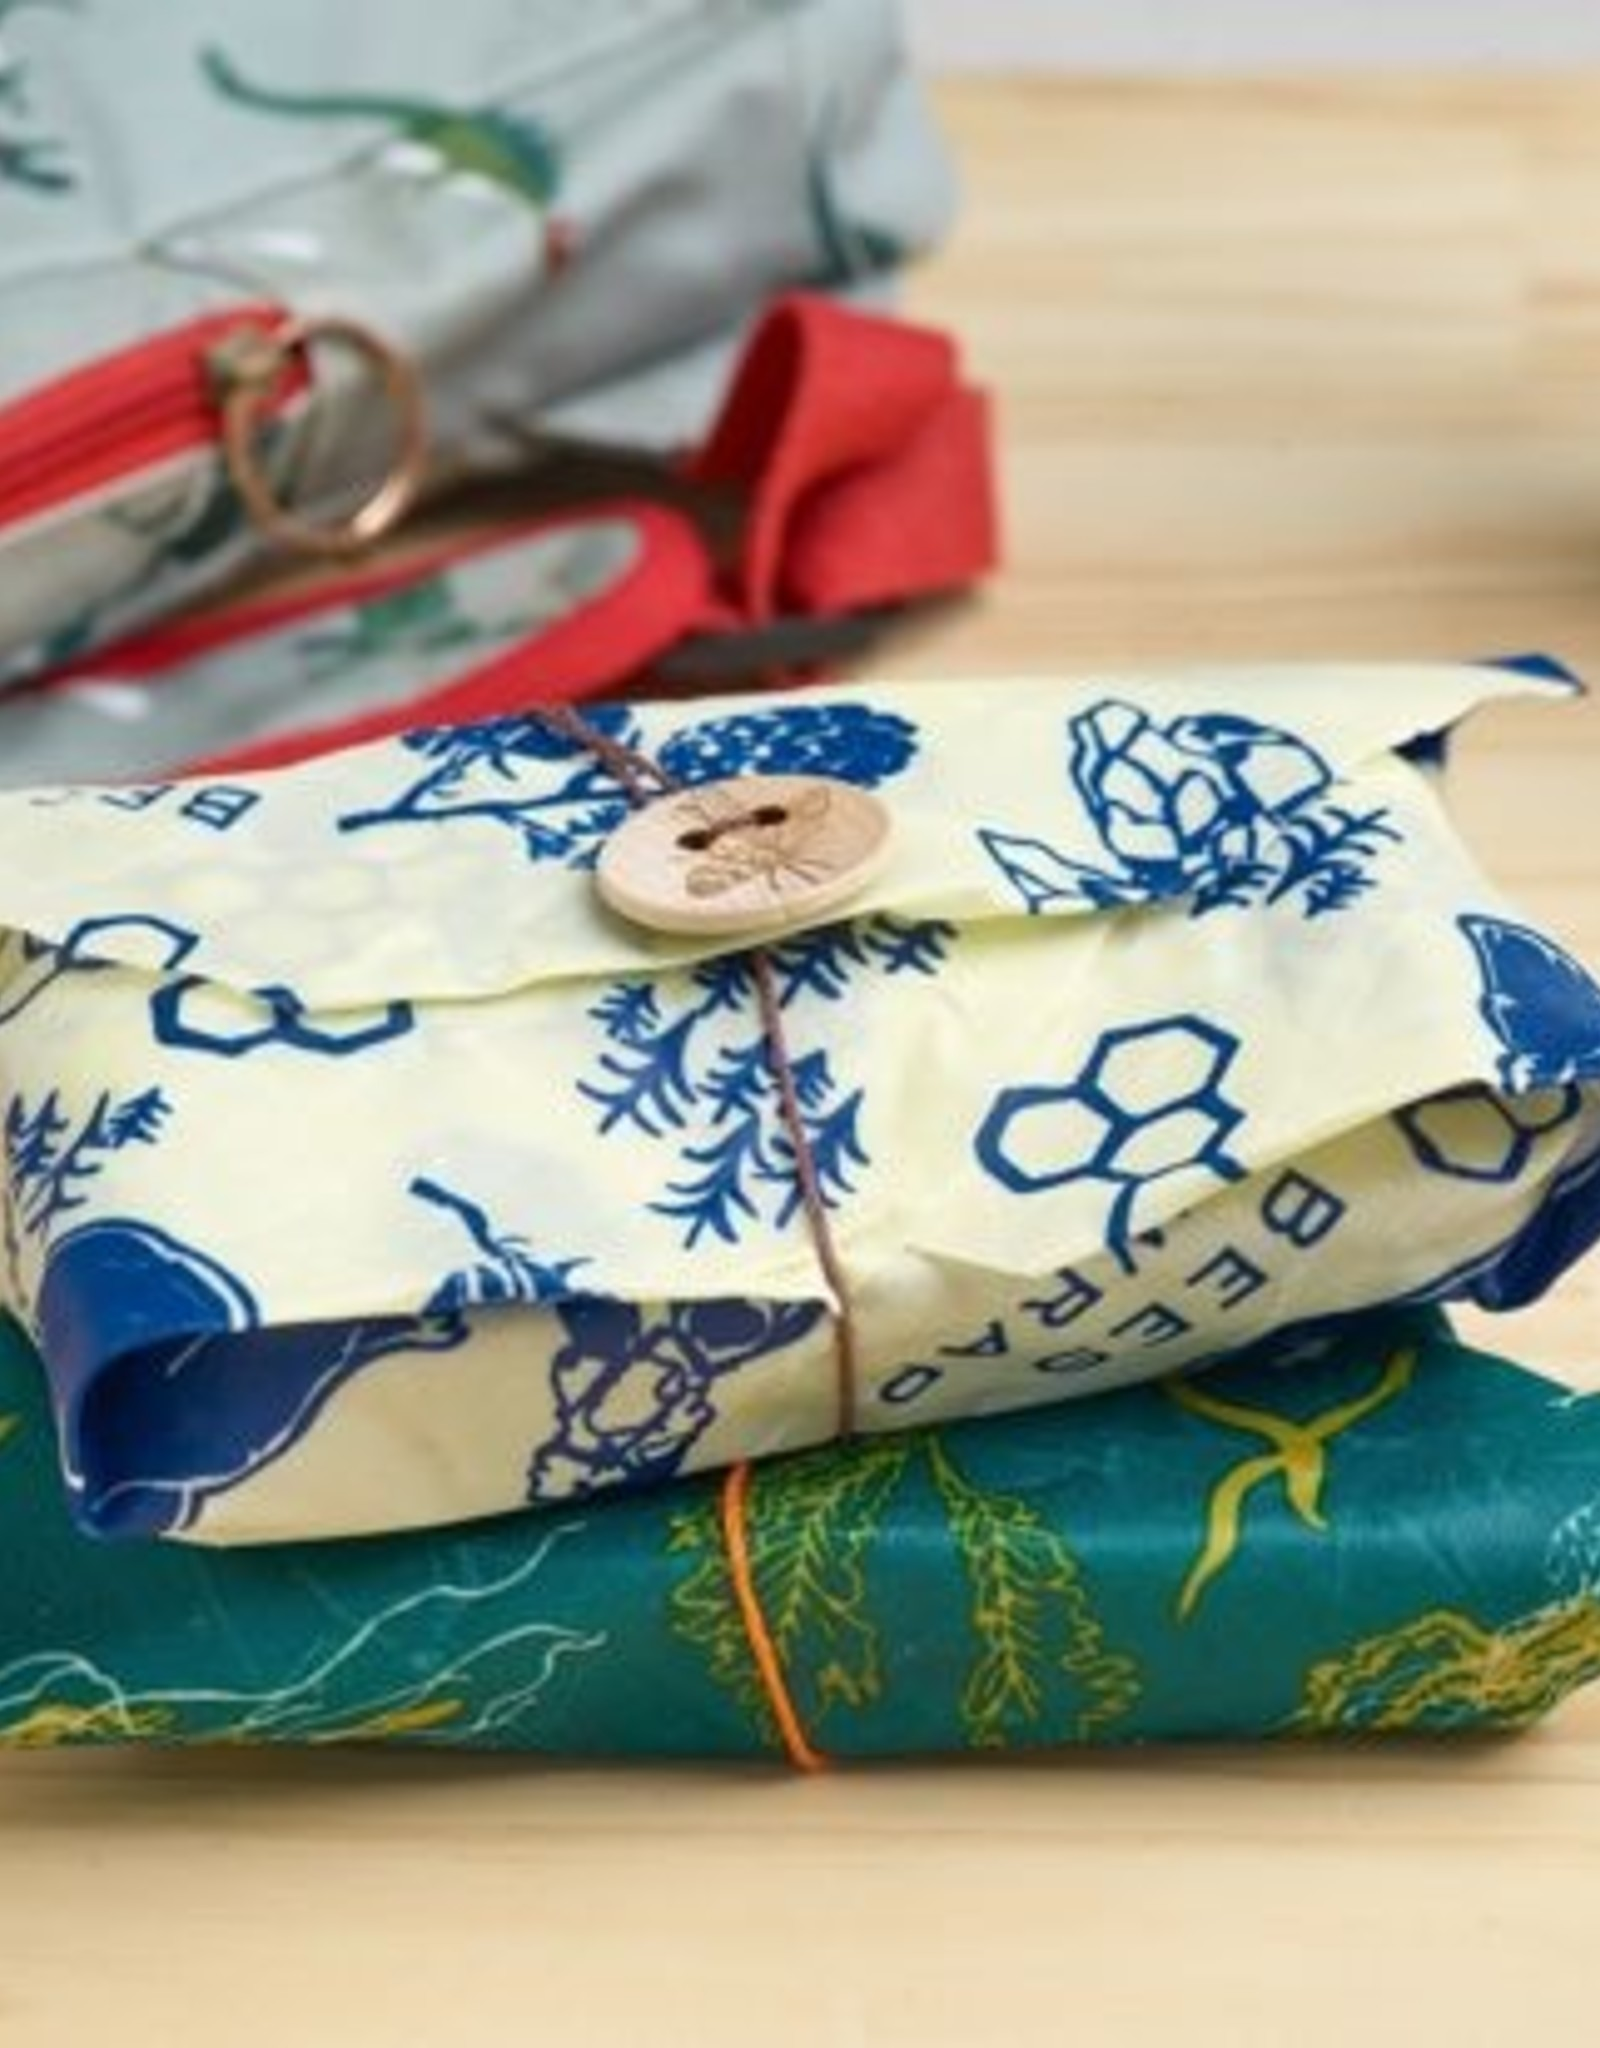 Bee's Wrap Bee's wrap - 2-pack Sandwich Wildlife